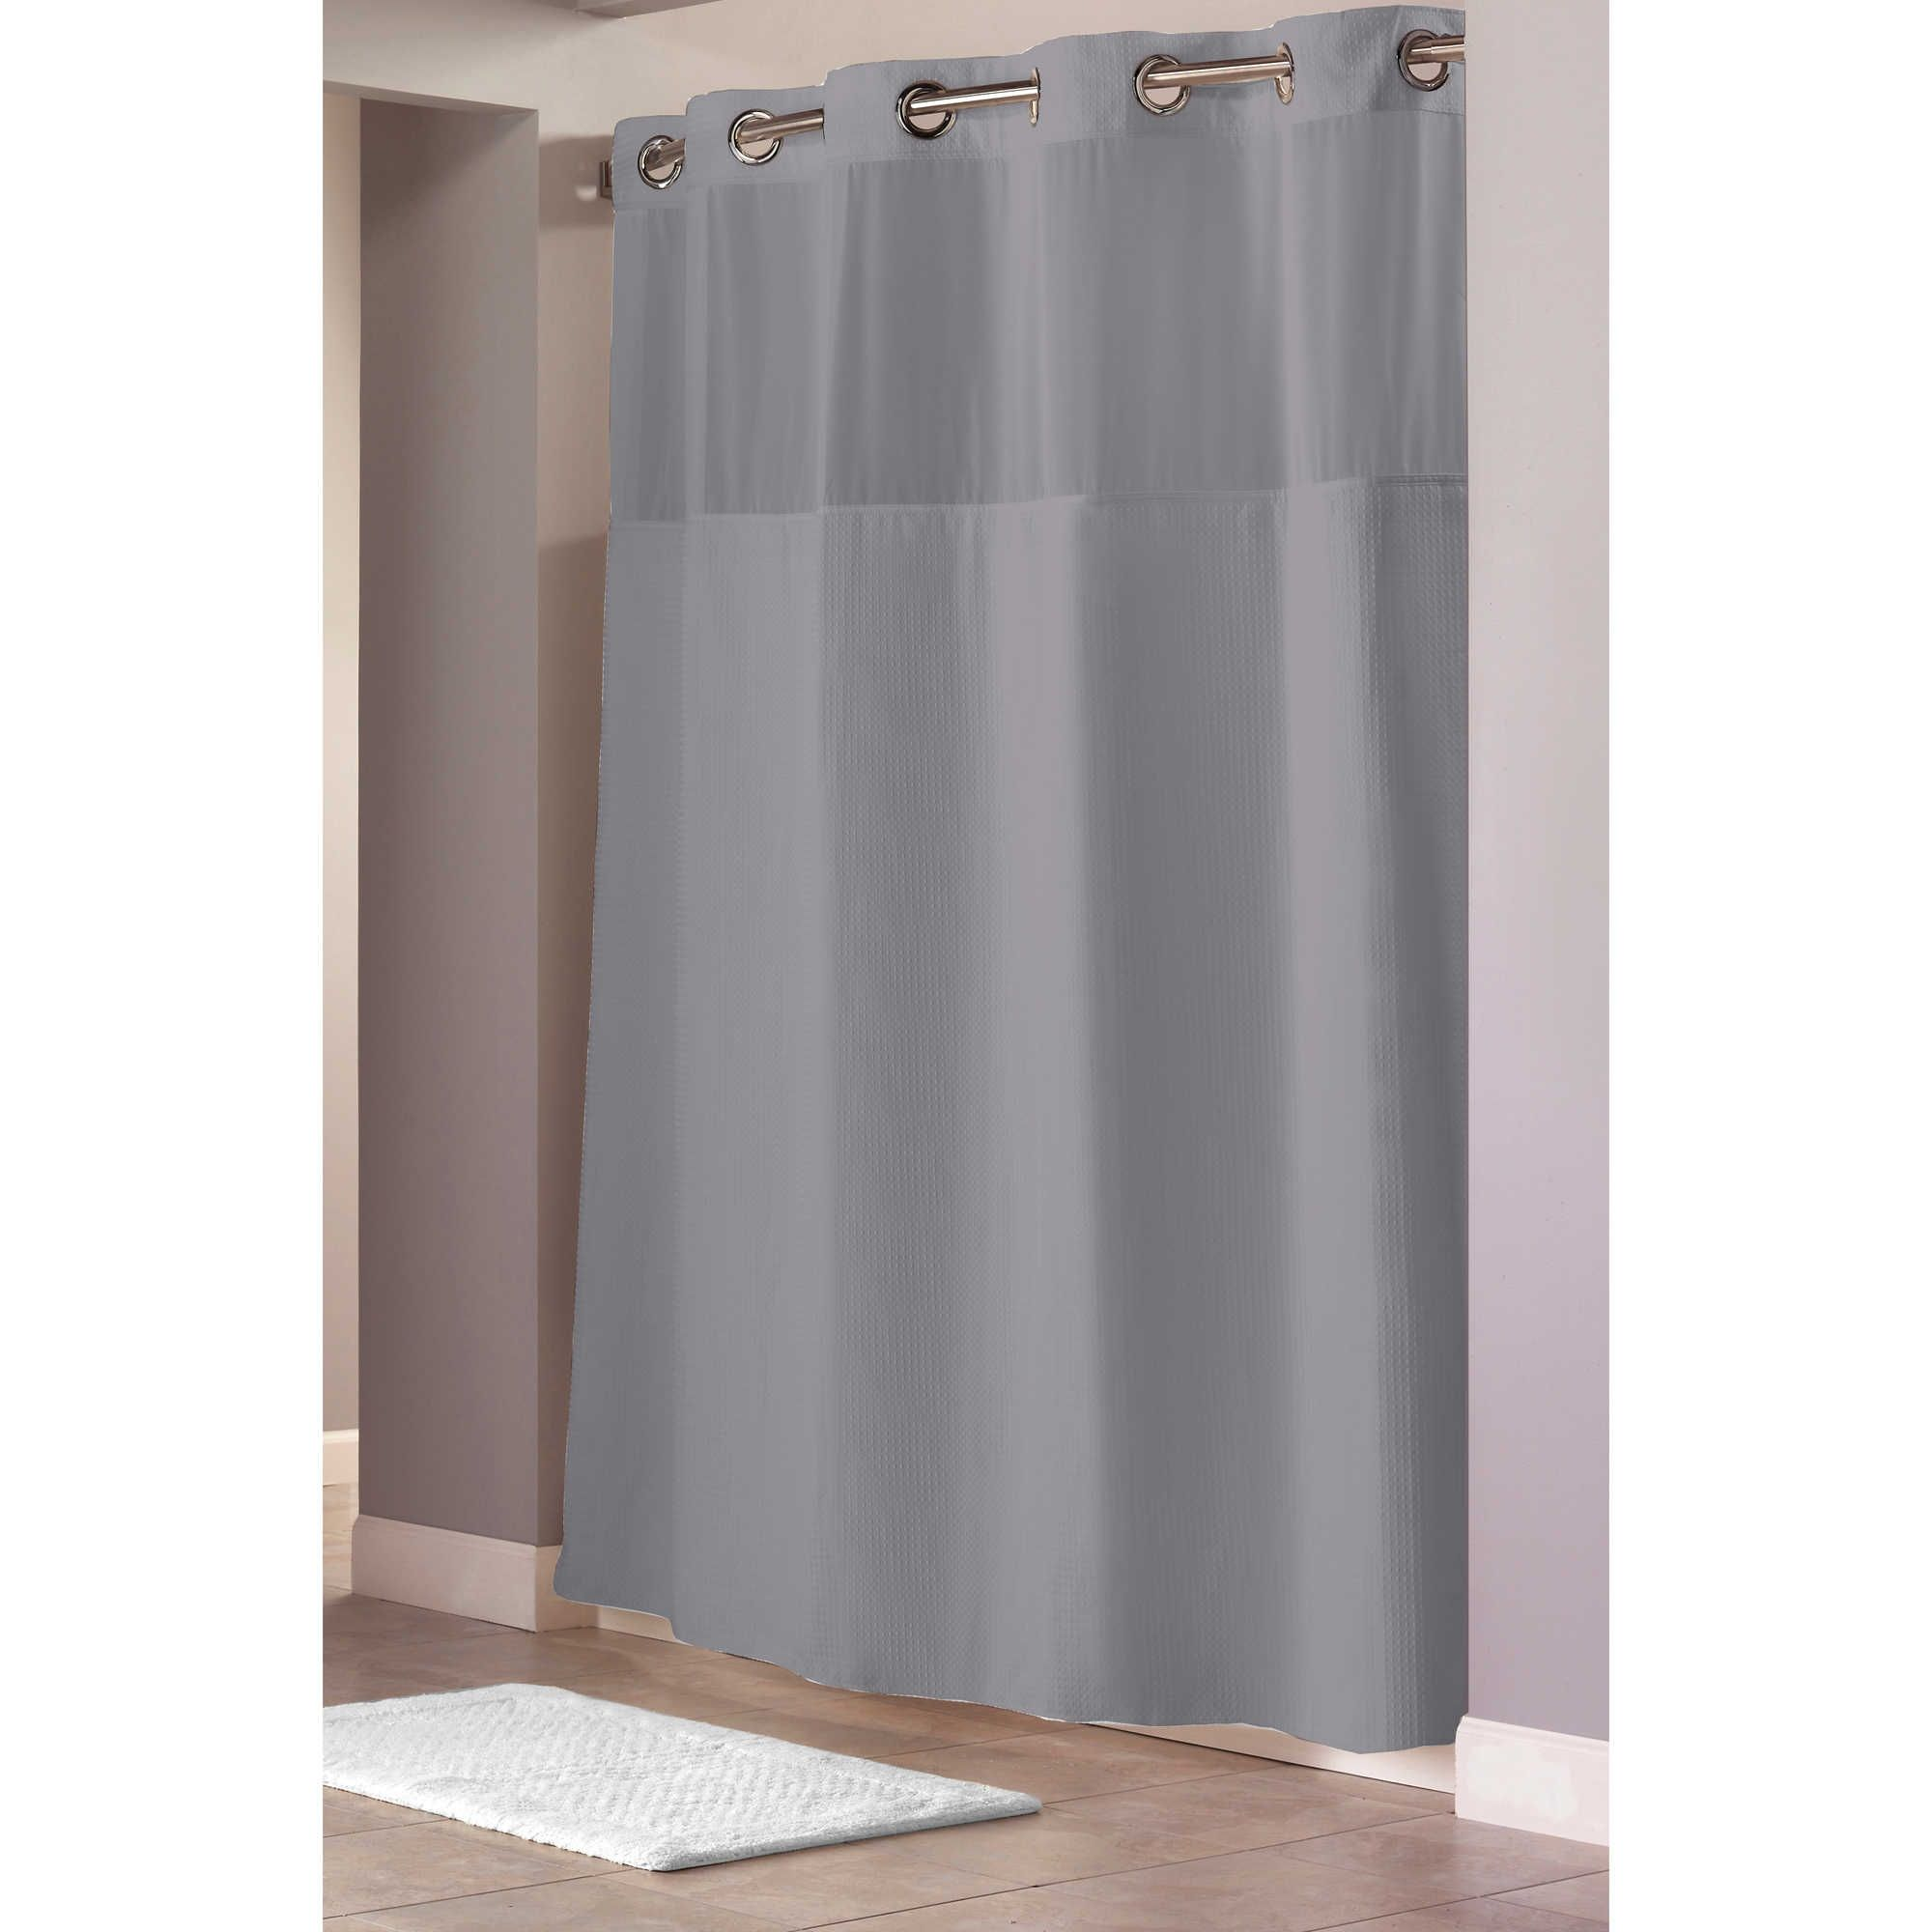 Hookless Shower Curtain 54 X 78